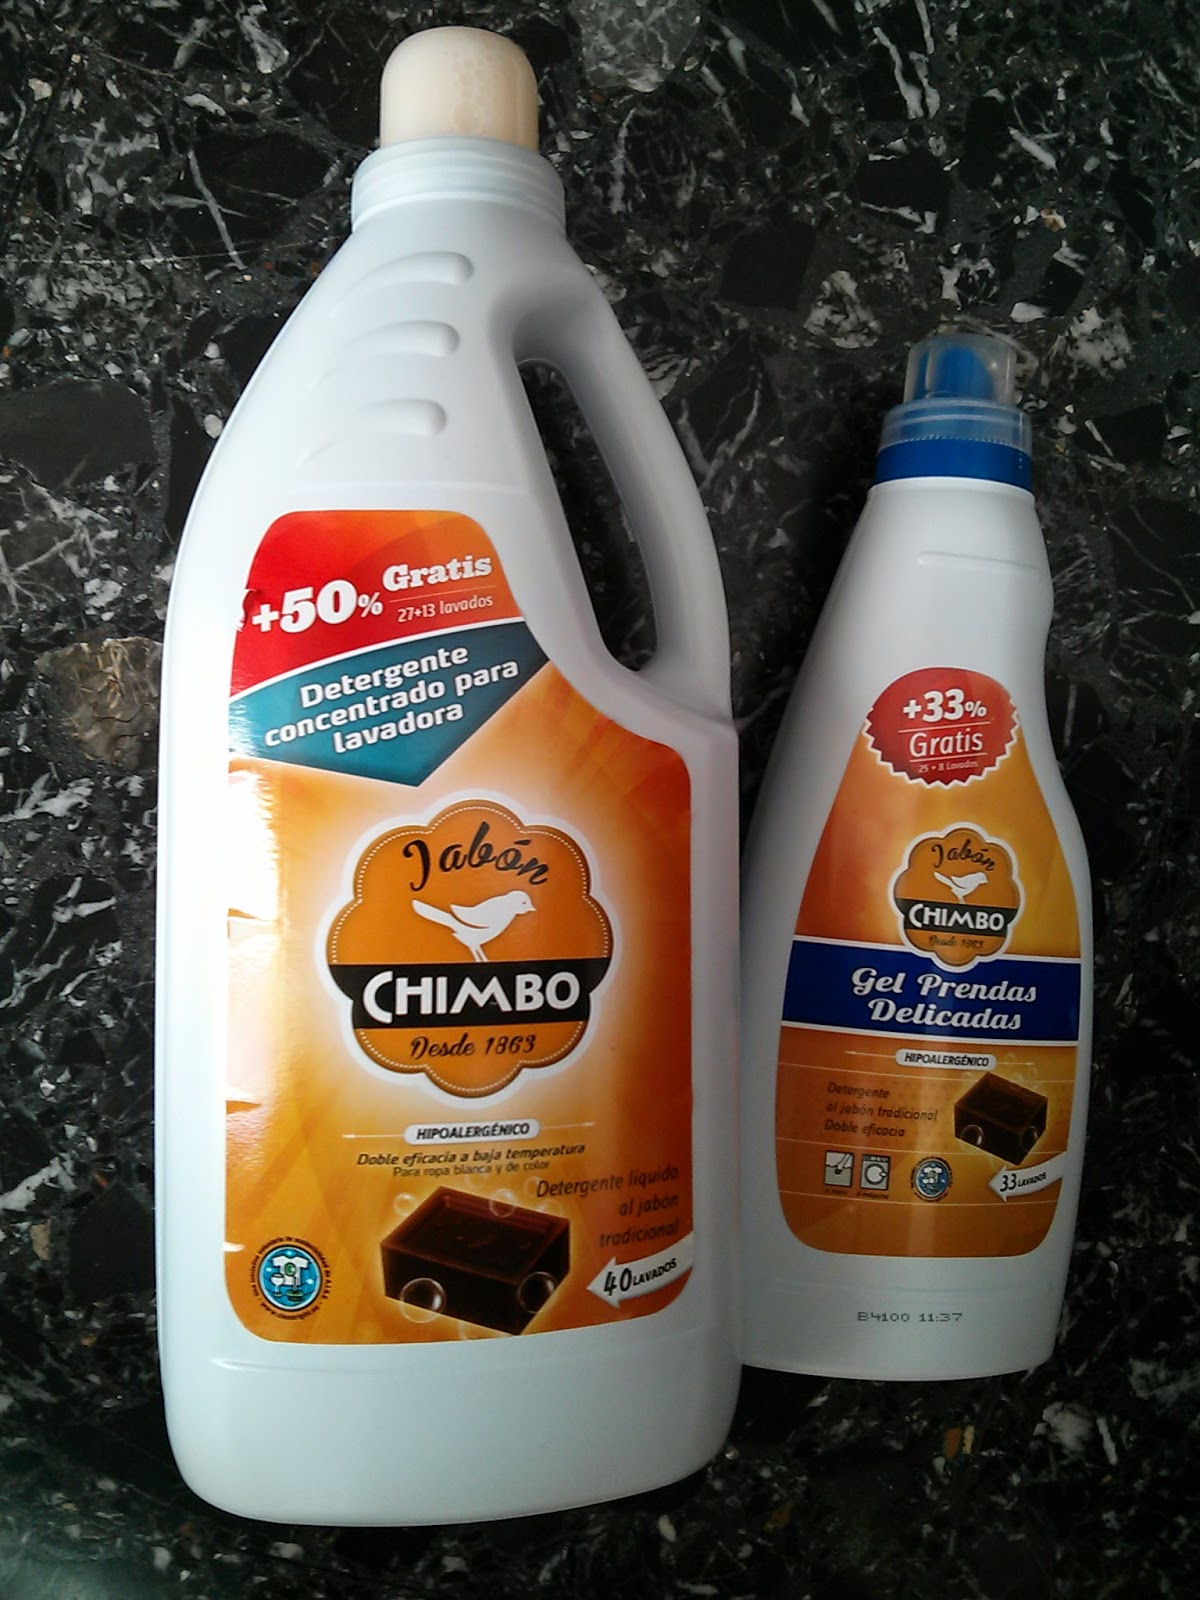 Jabon chimbo lavadora